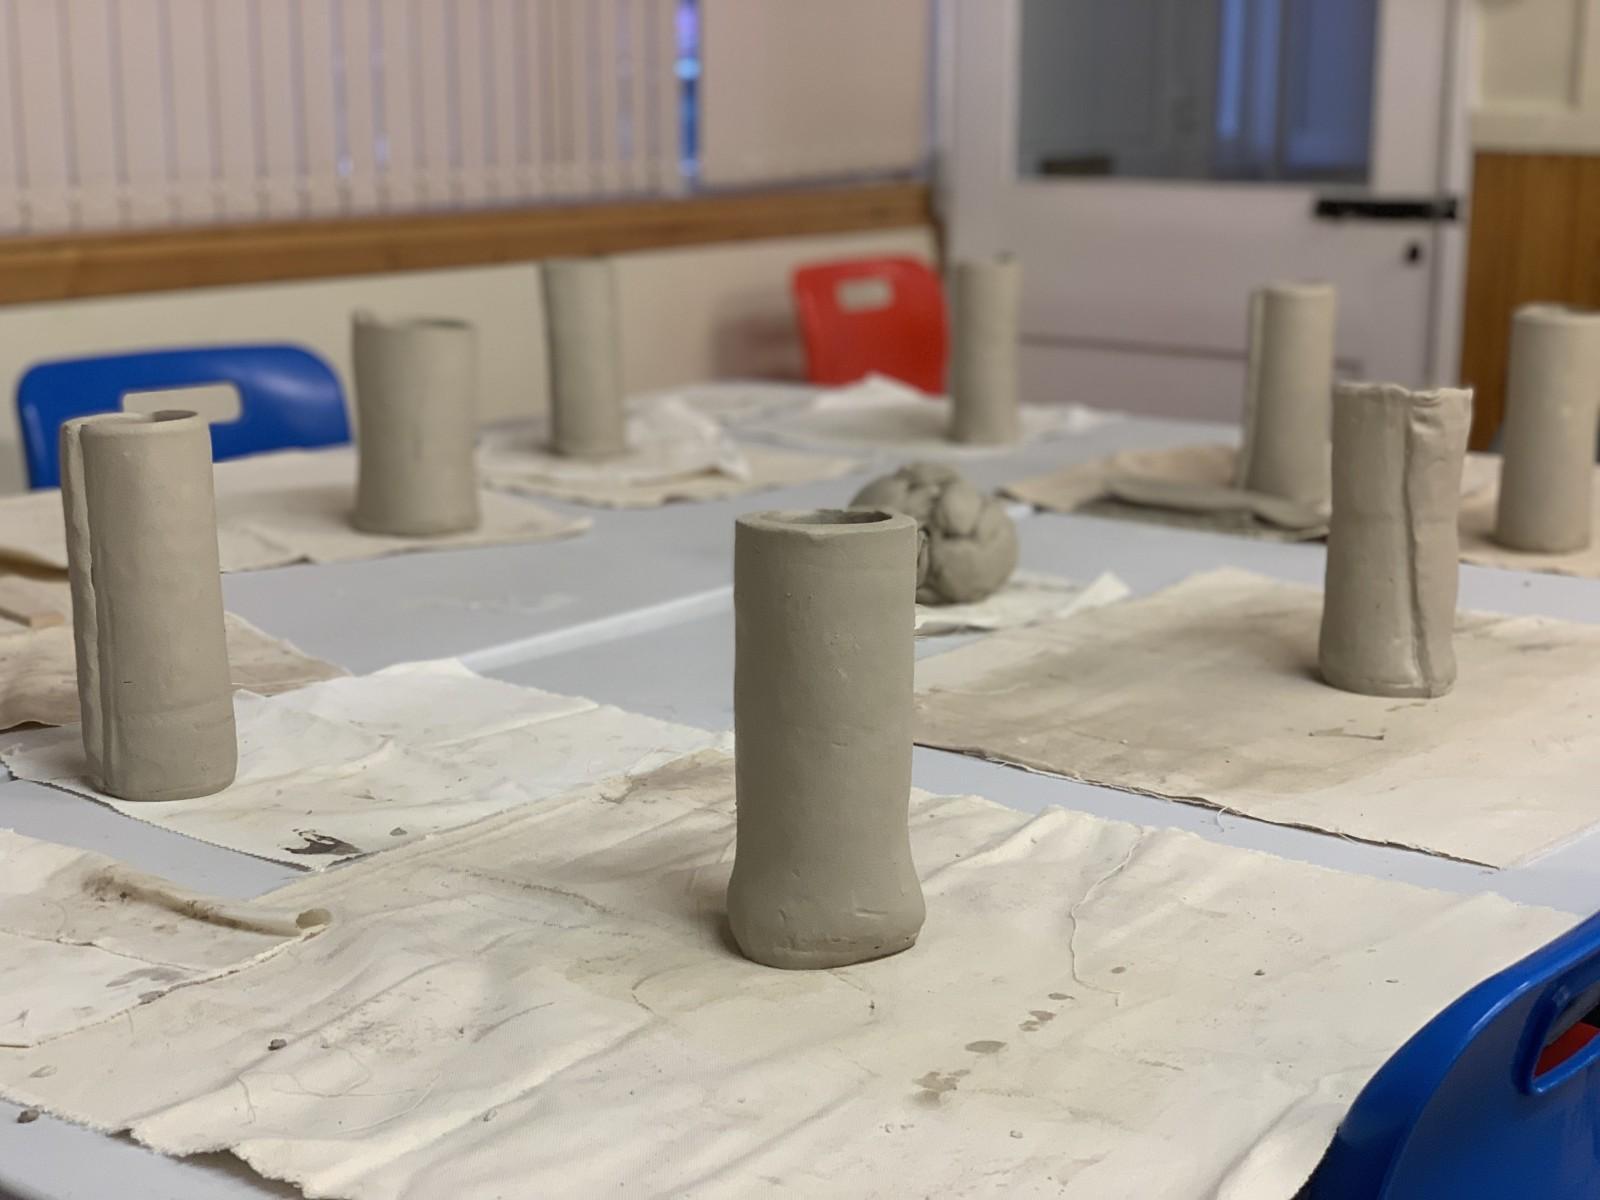 Pots standing upright